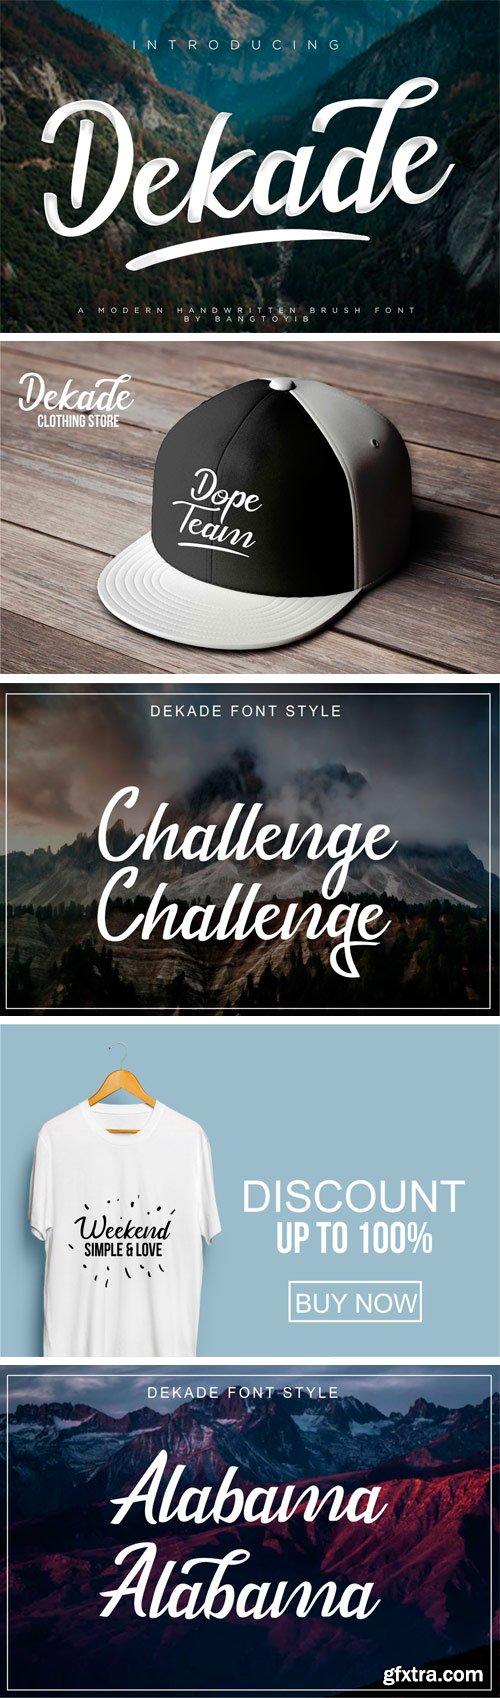 Fontbundles - Dekade Brush Font 64854